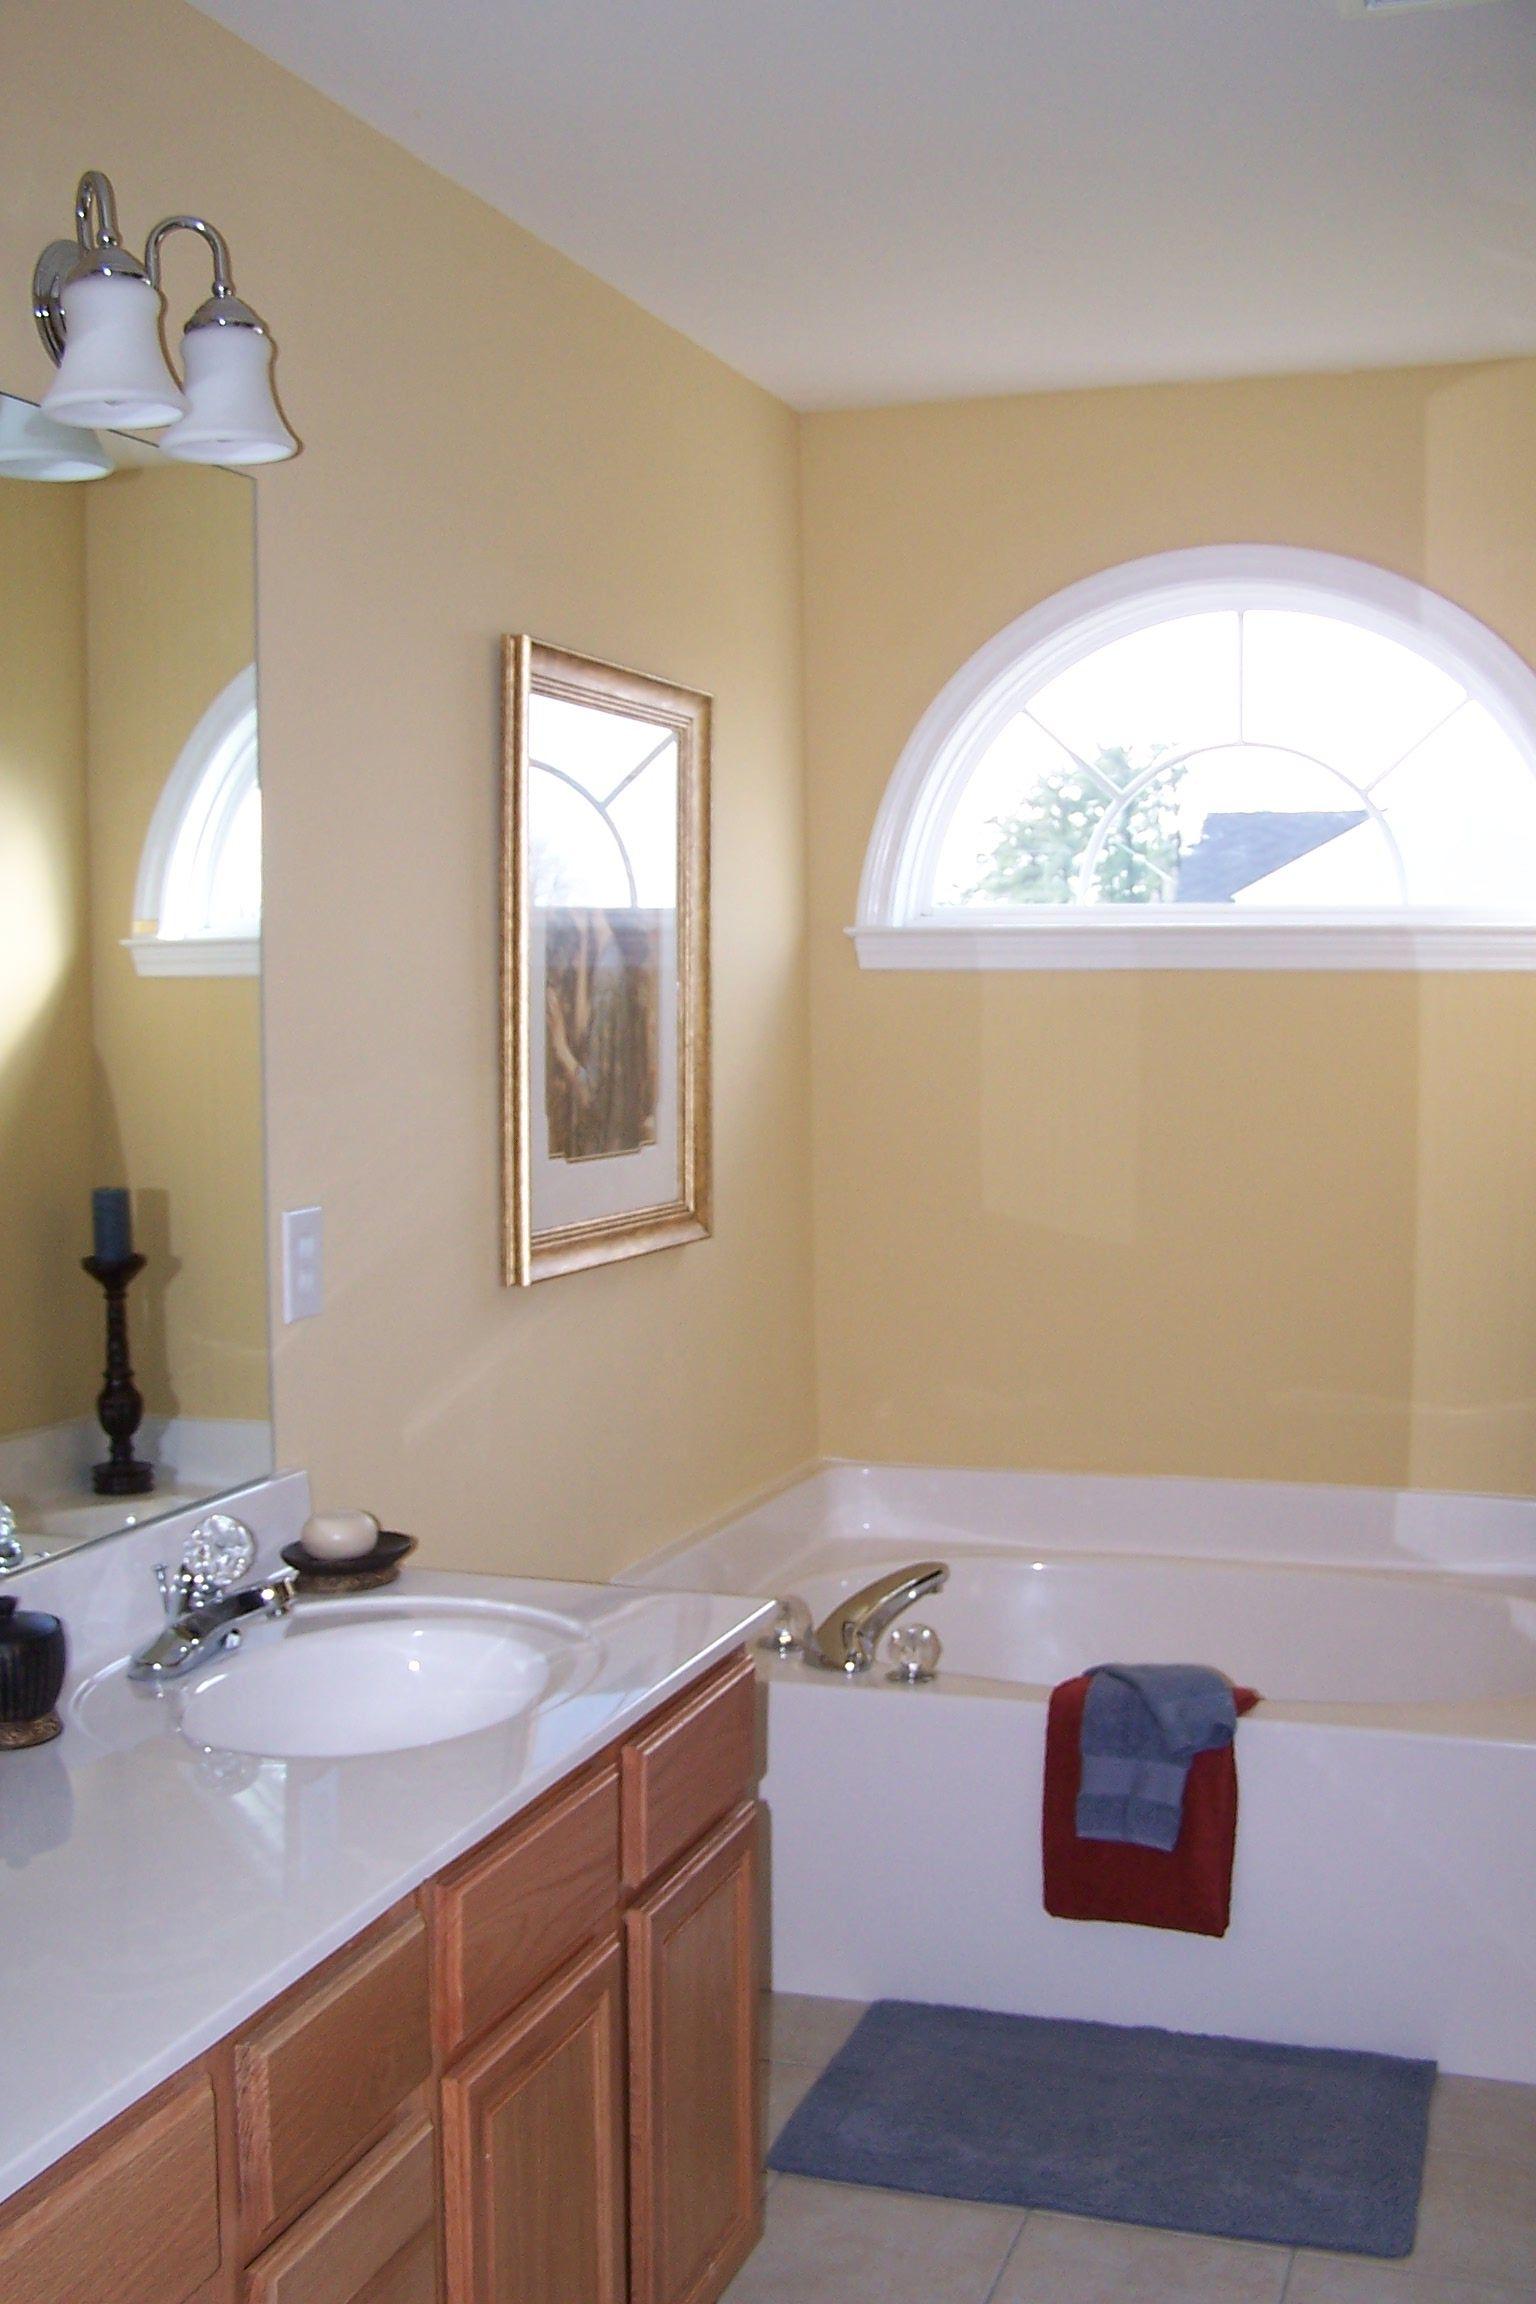 Bathroom featured in The Lockwood II By Lockridge Homes in Charleston, SC